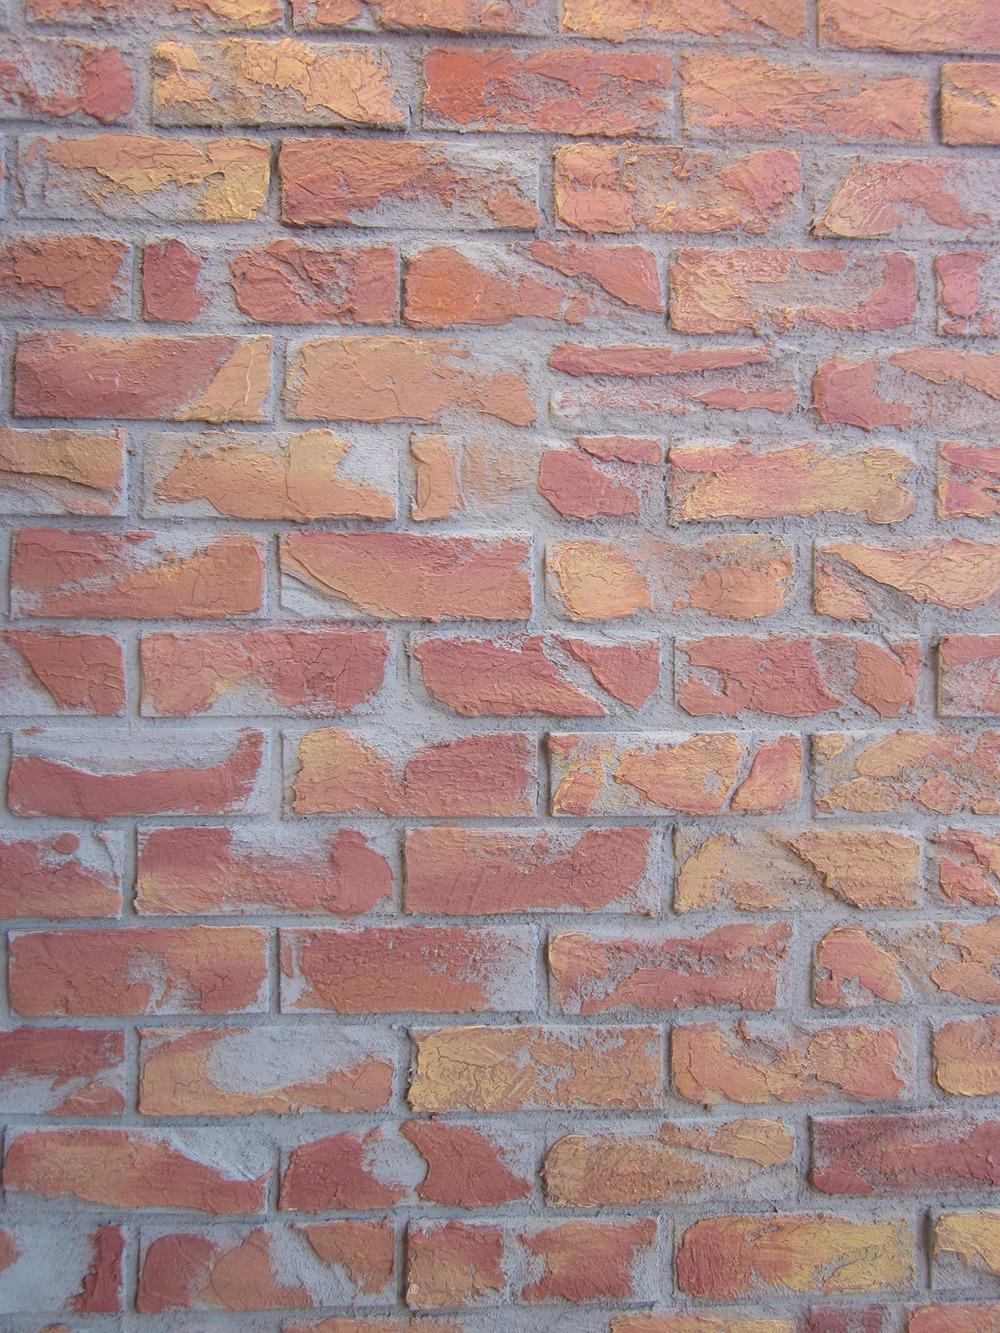 Brick Homasote with Jaxsan and Paint